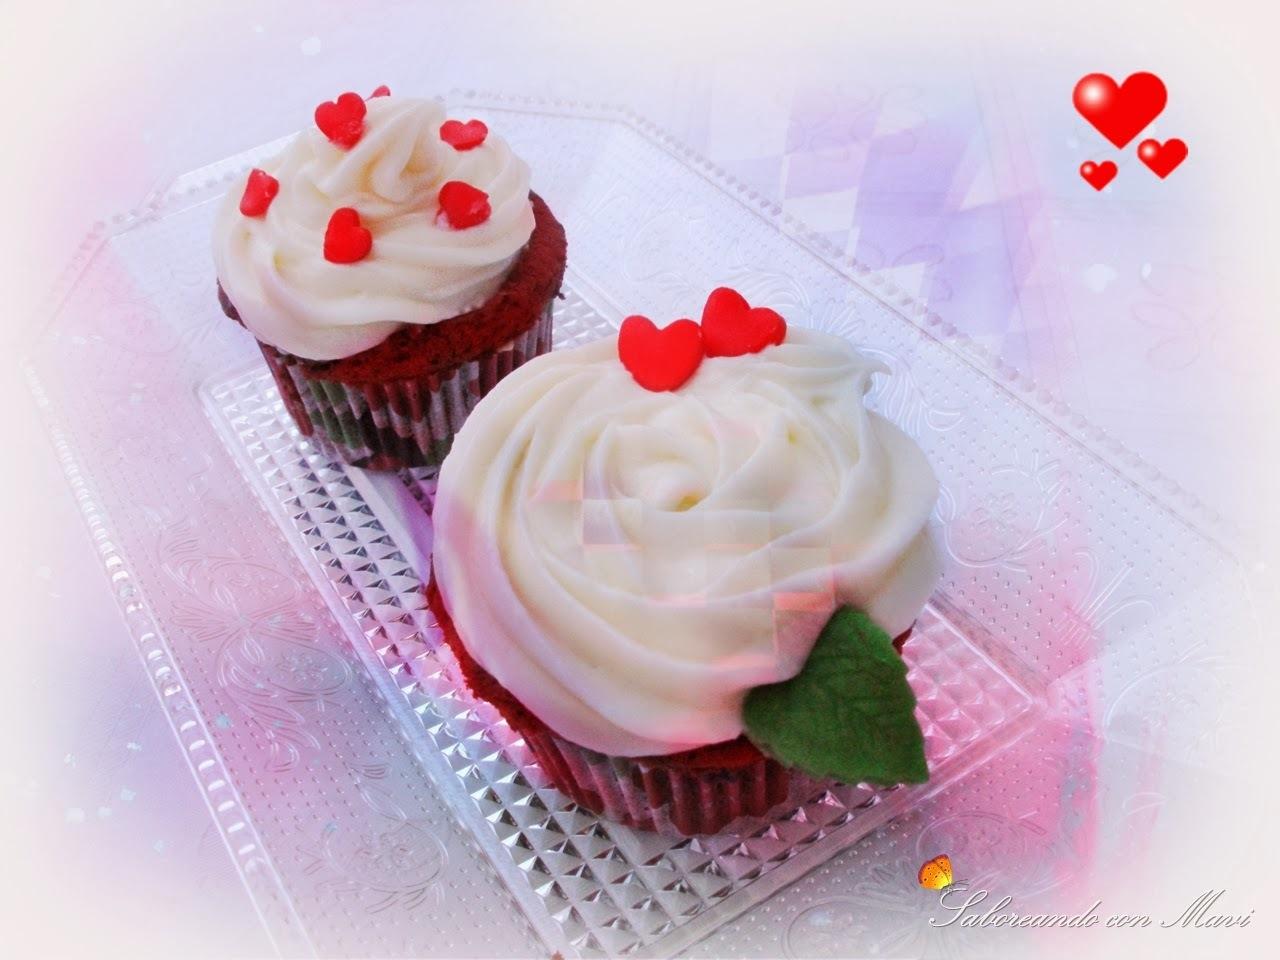 Cupcake's San Valentín Redvelet